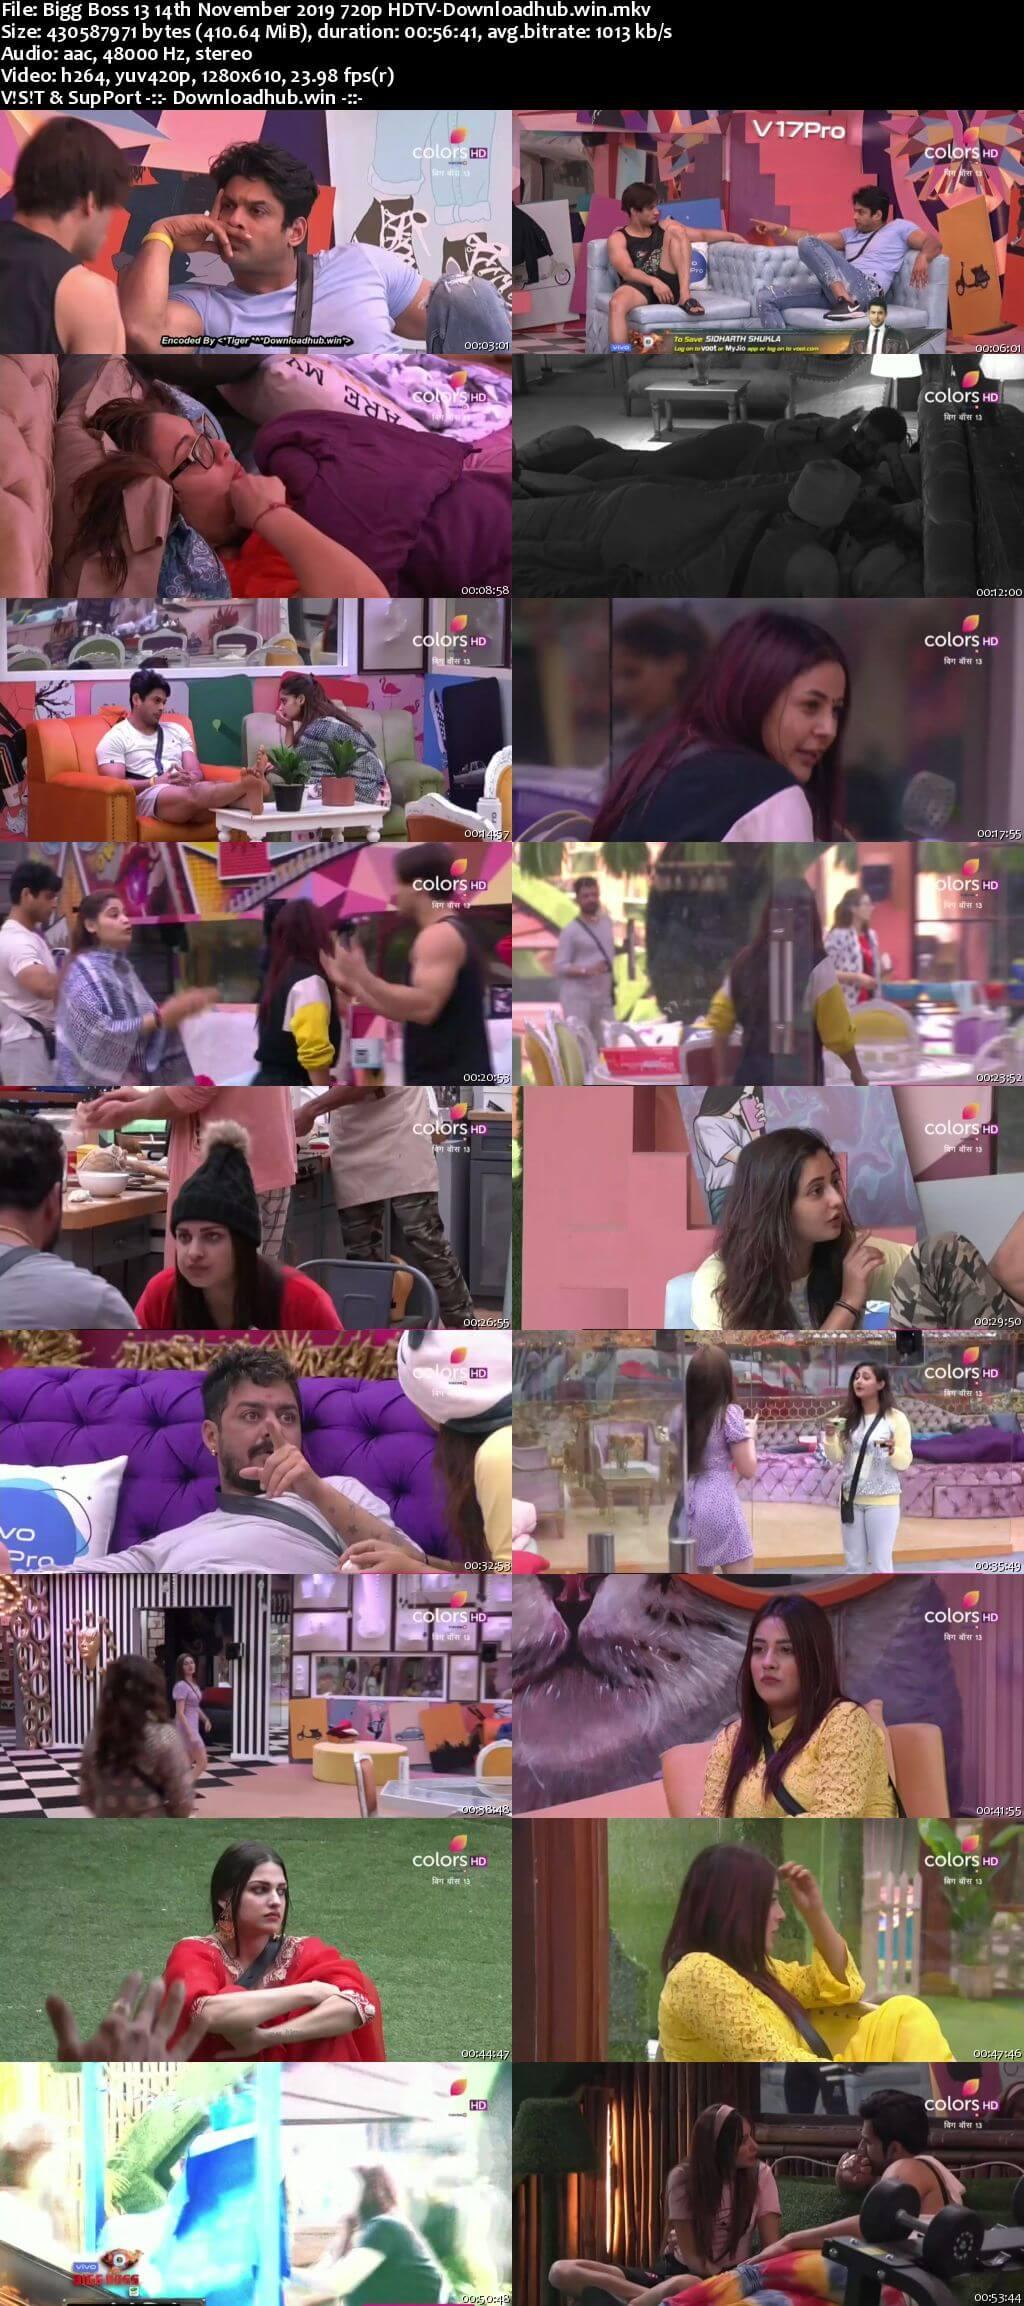 Bigg Boss 13 14 November 2019 Episode 45 HDTV 720p 480p